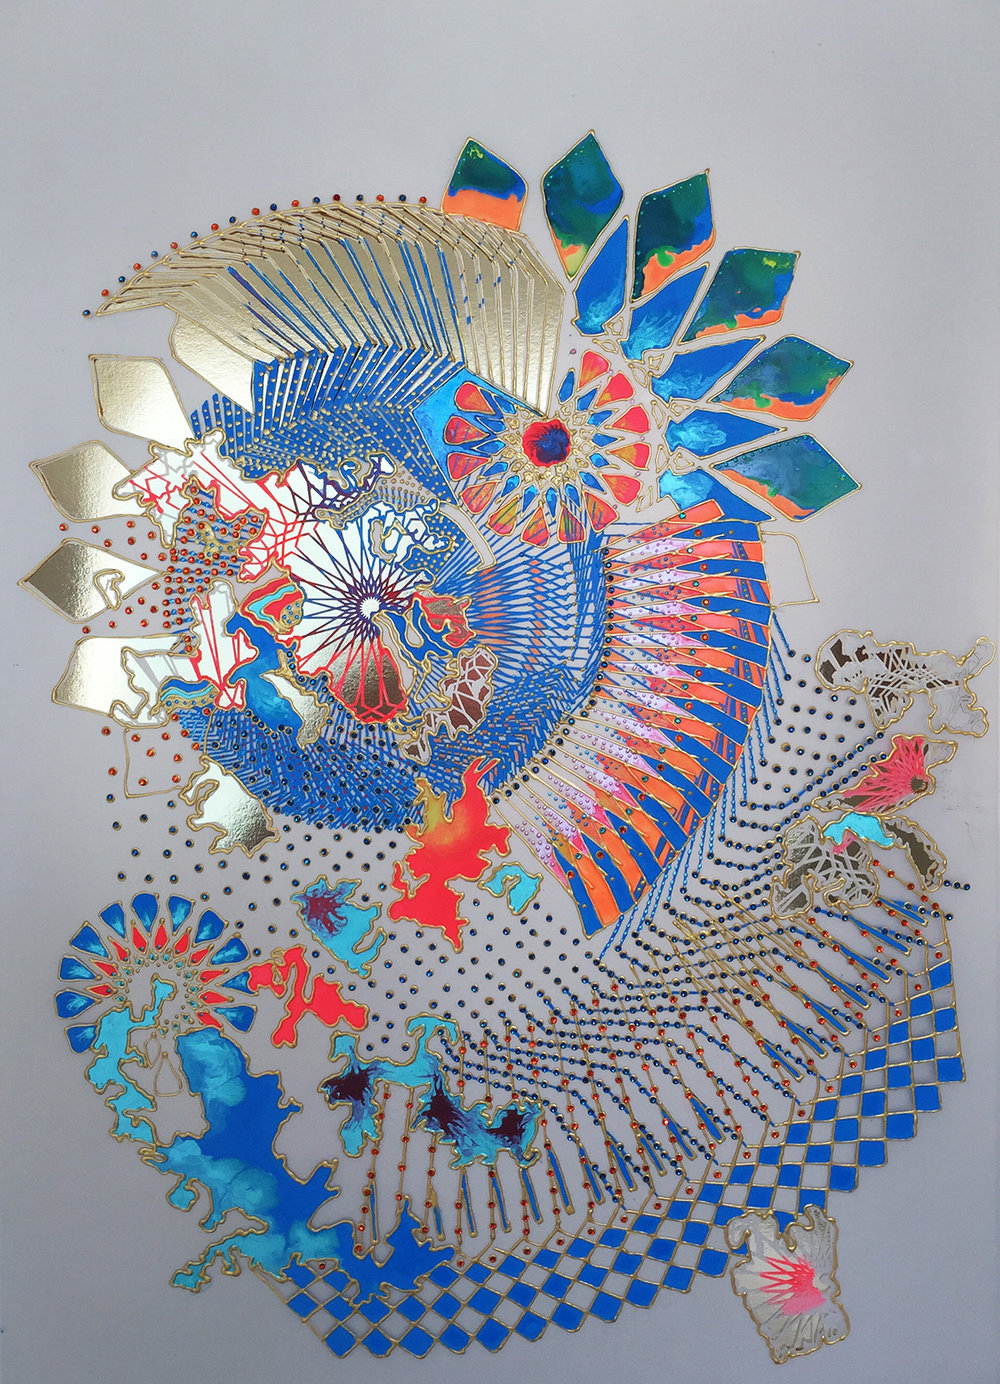 Untitled Study (Khanebani) No. 1